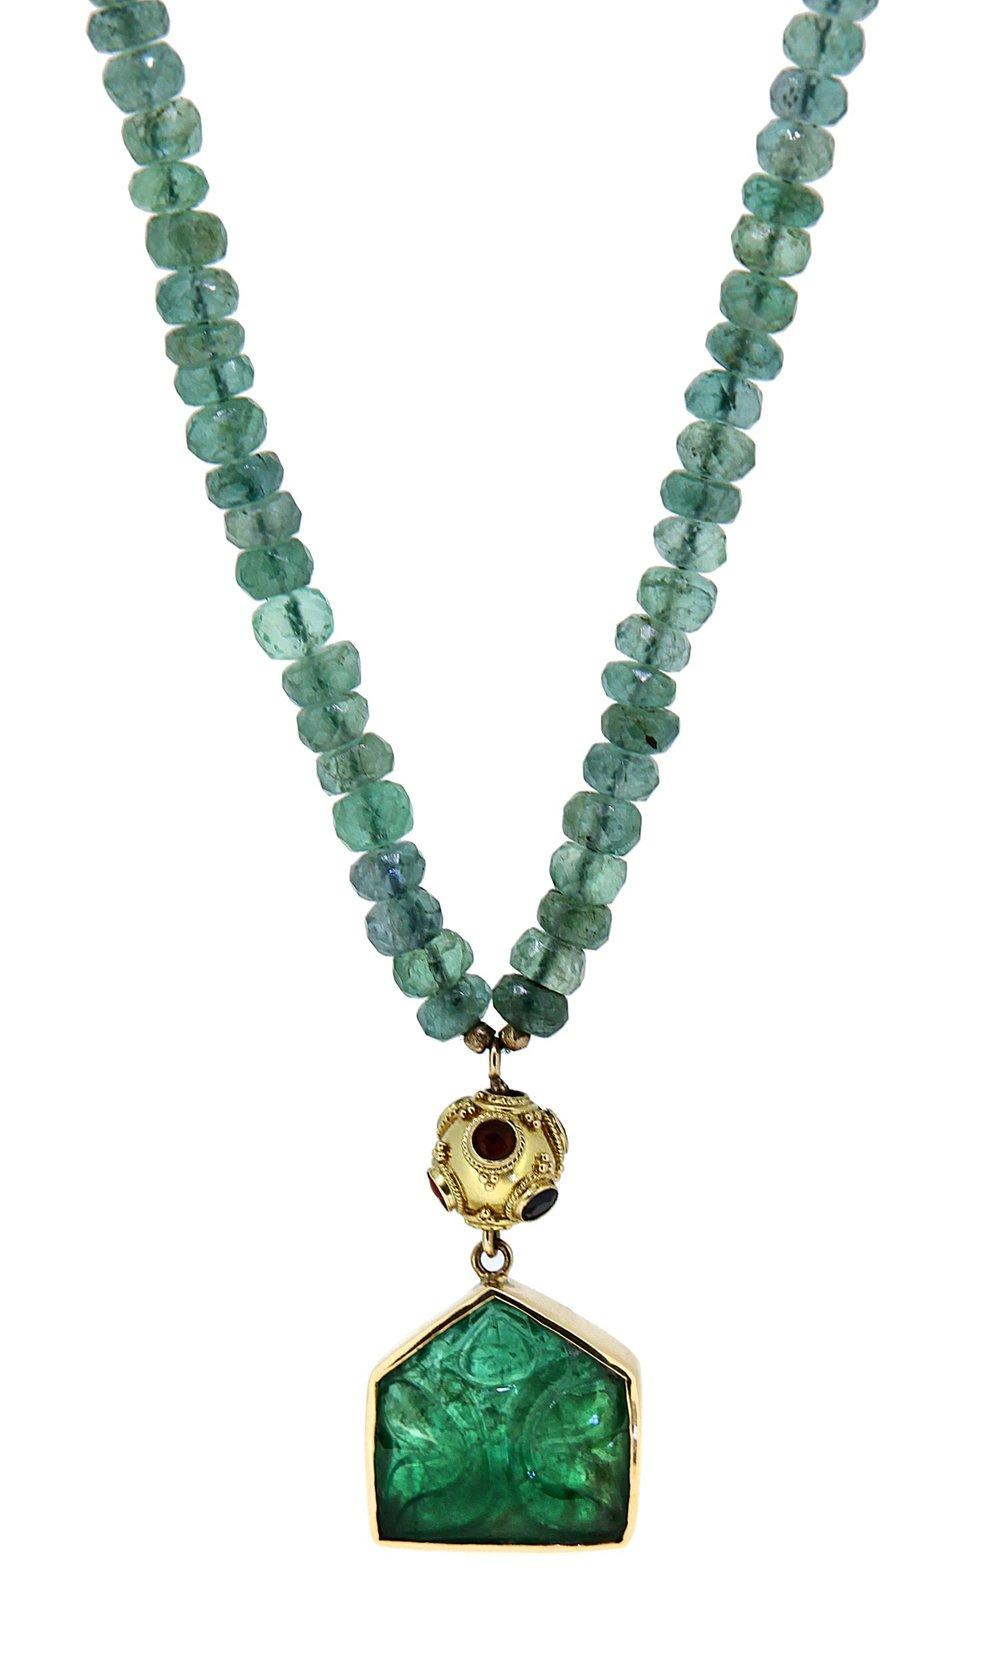 carved-emerald-neckalce.jpg